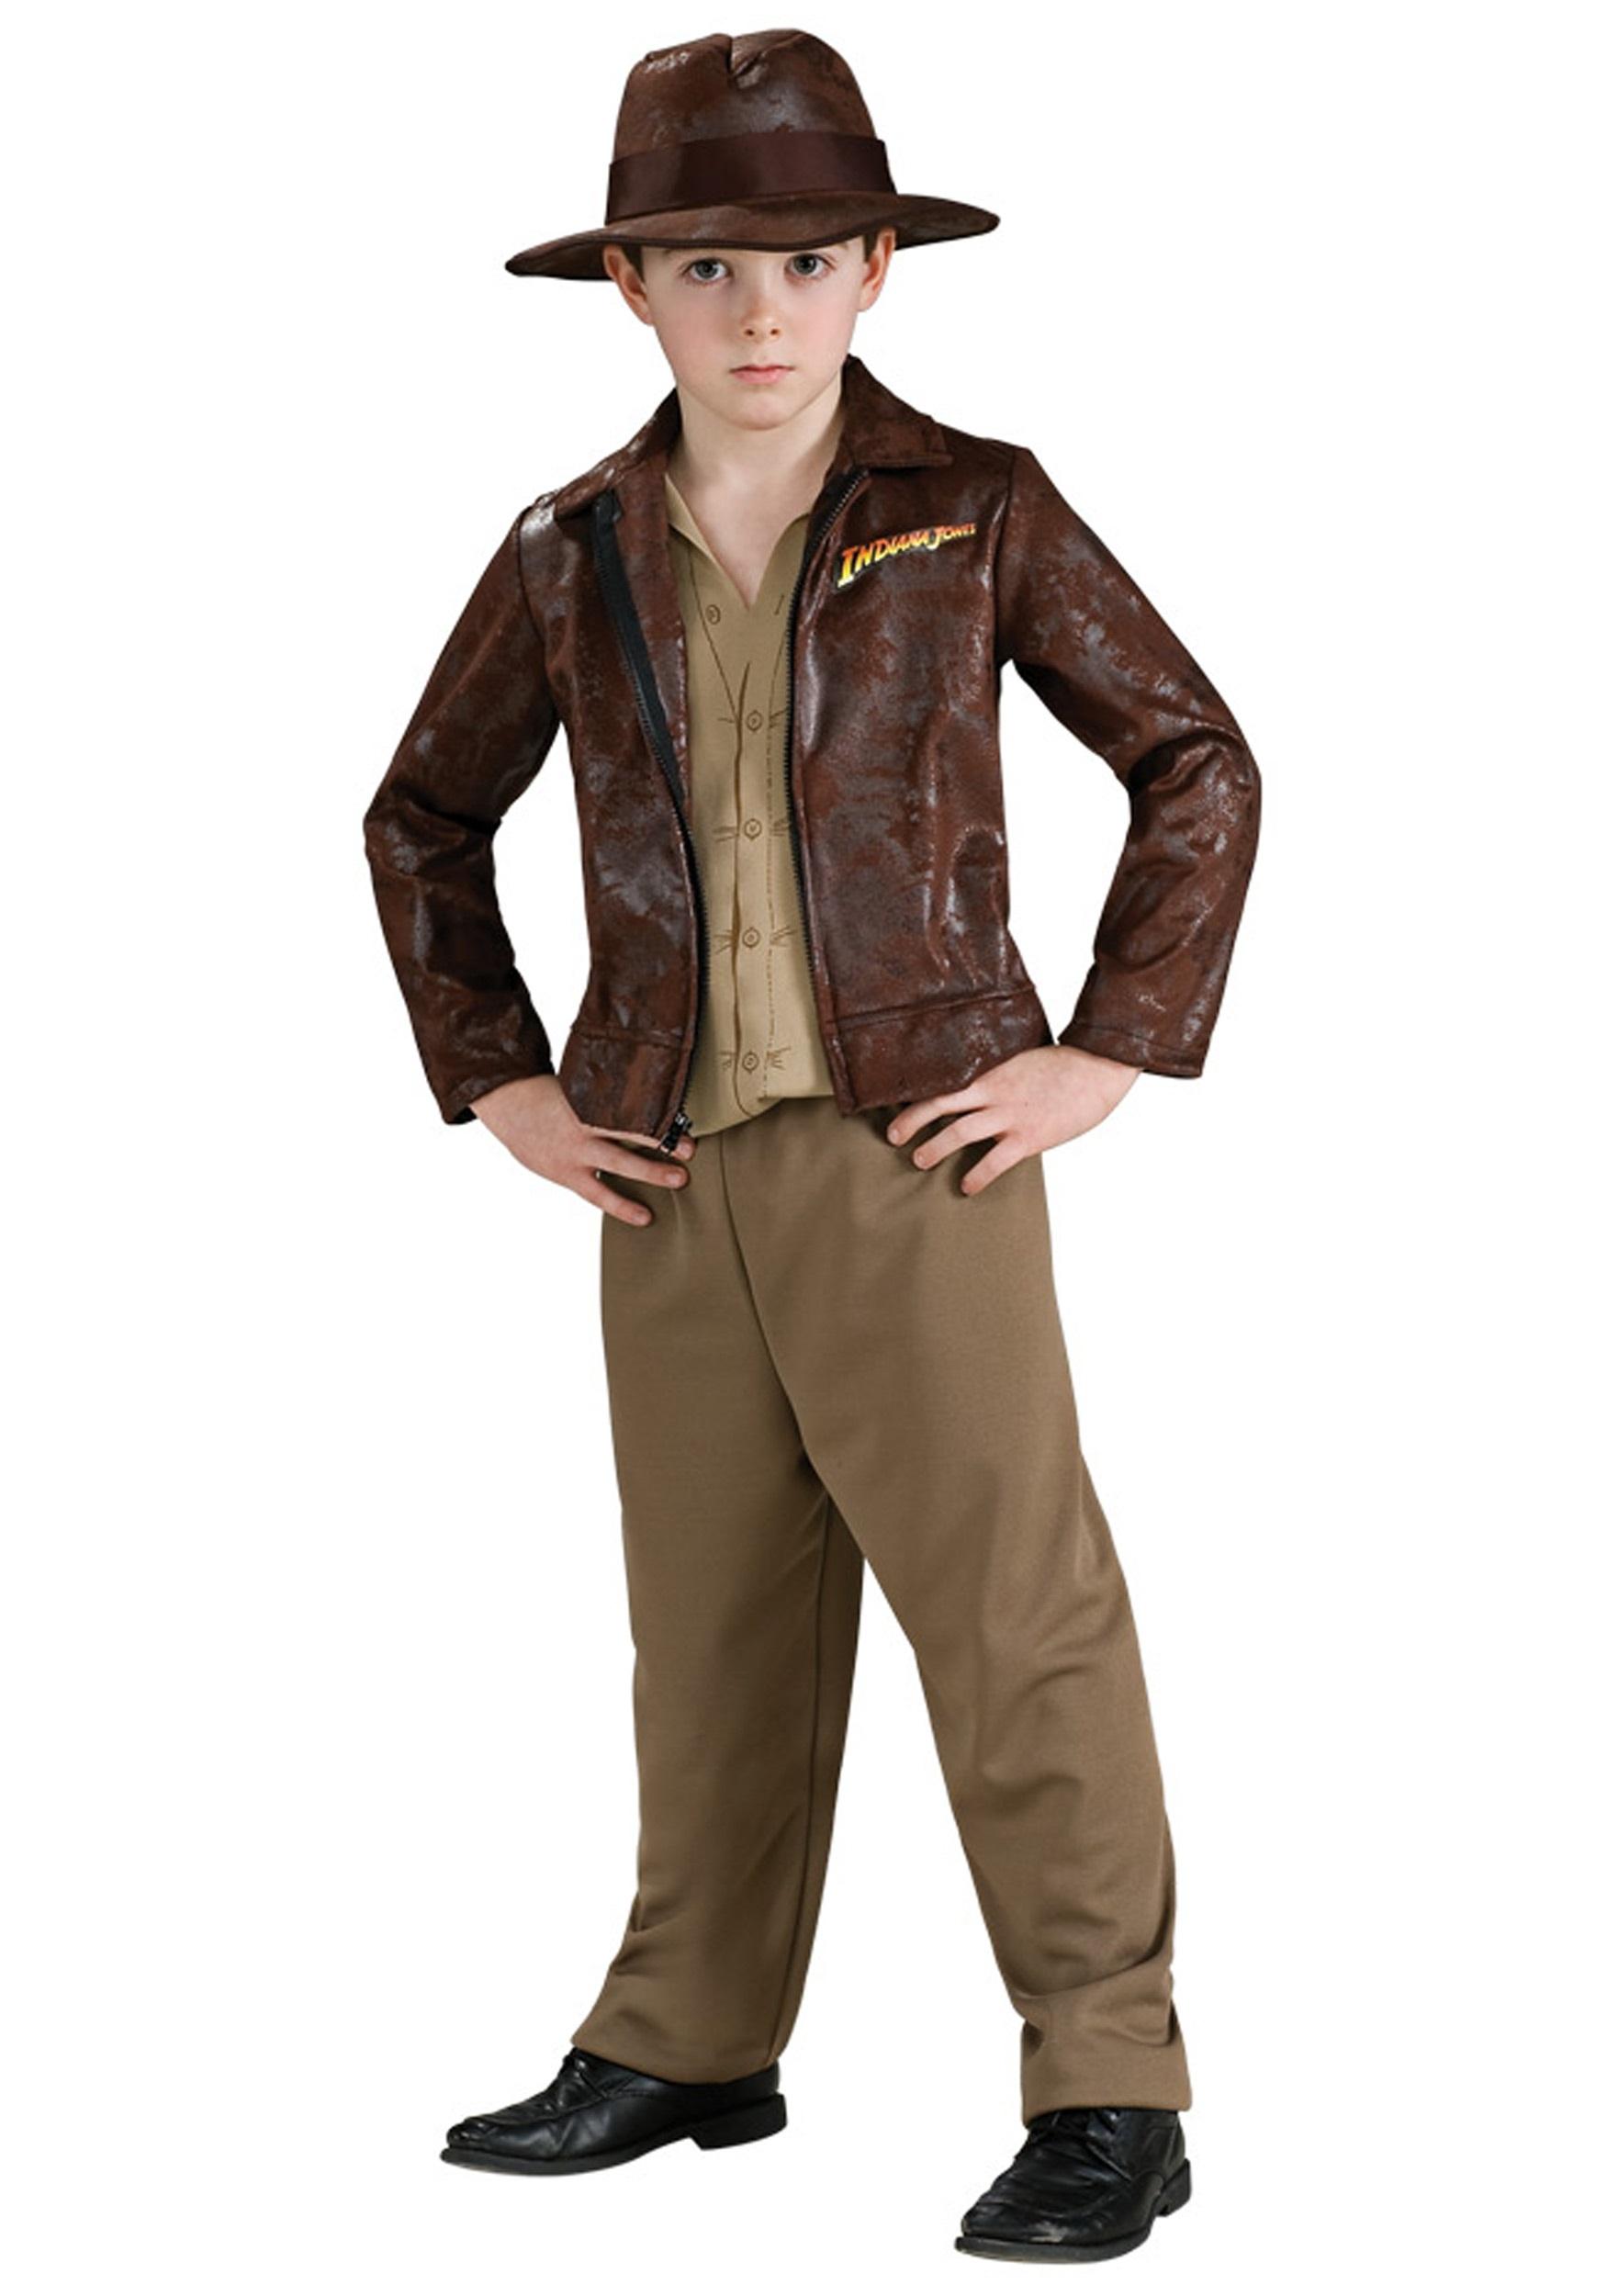 Deluxe Boys Indiana Jones Costume